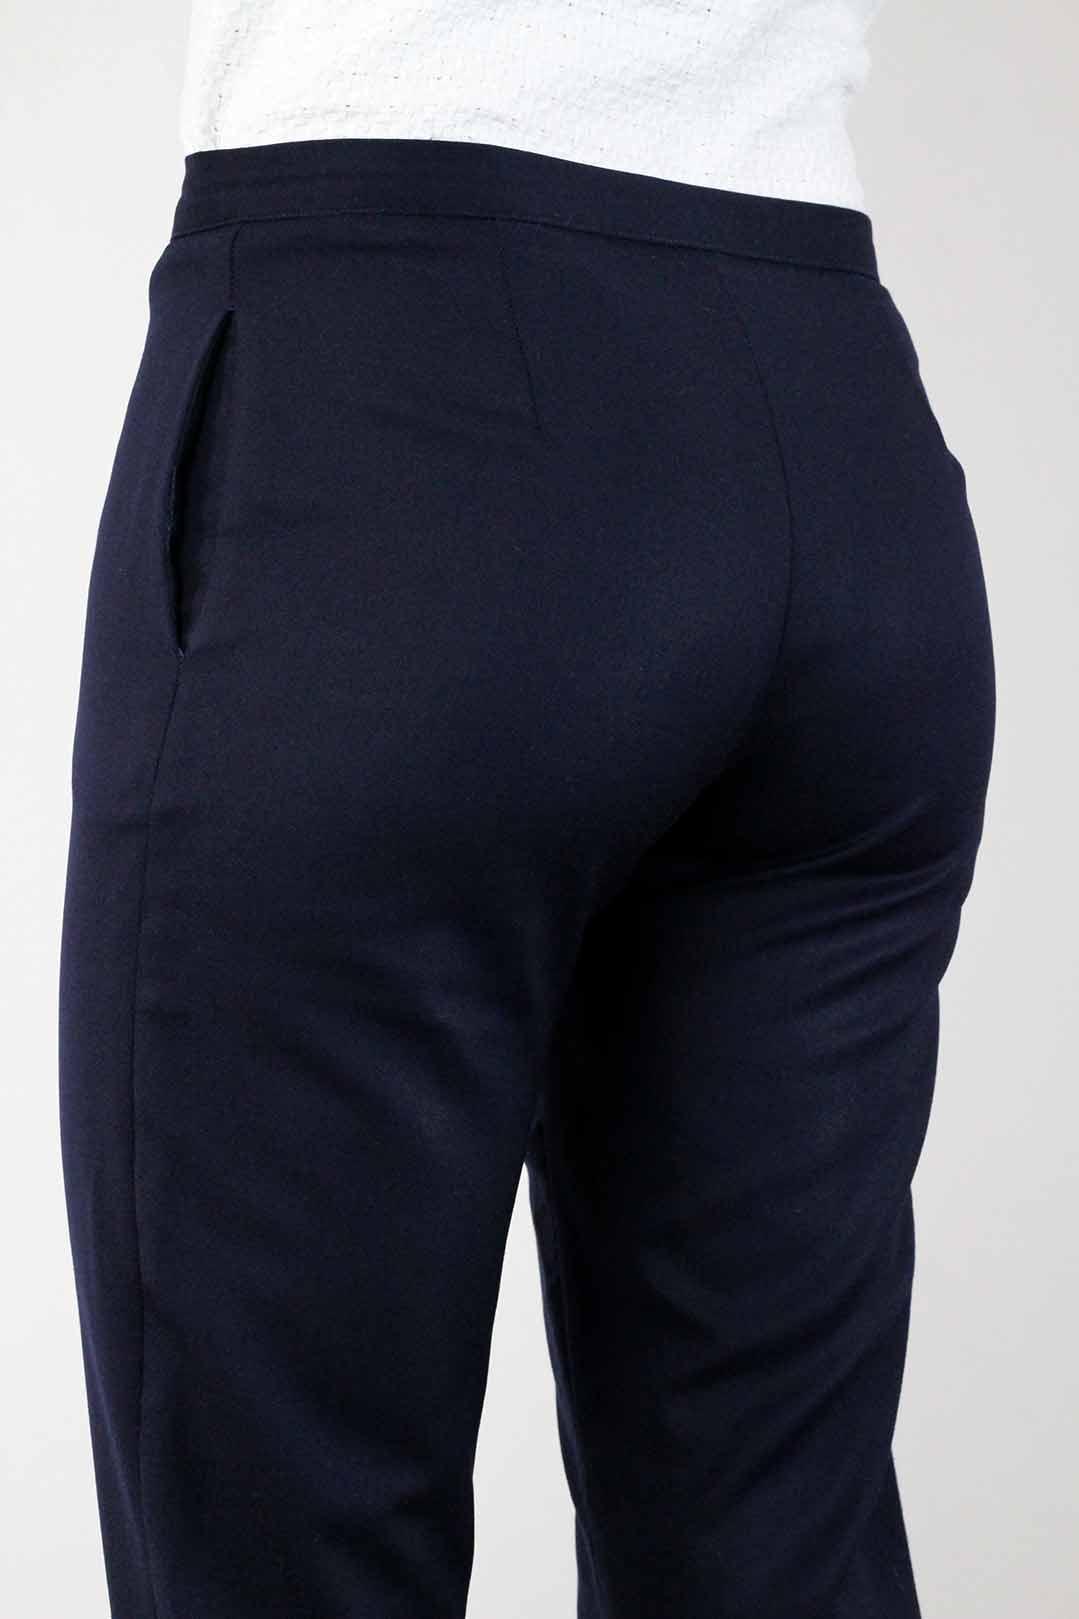 pantalon tailleur femme bleu marine 3